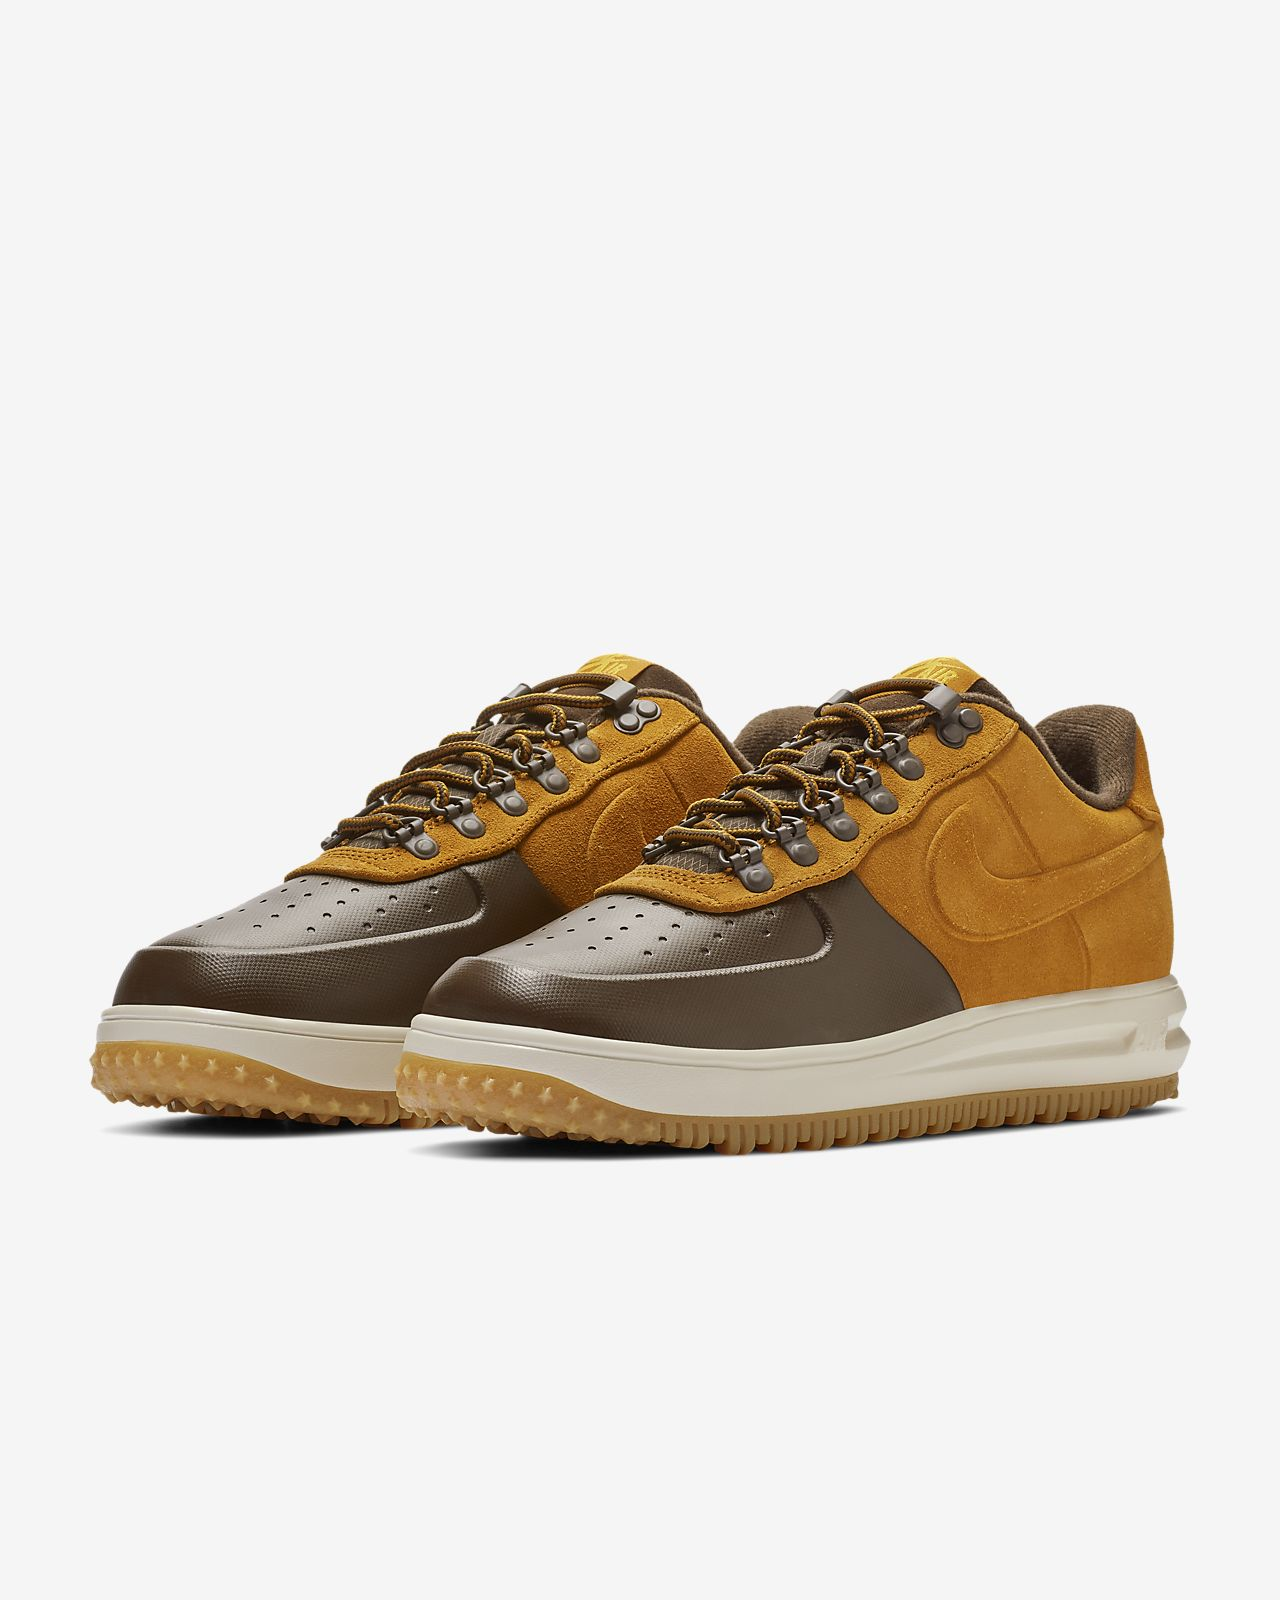 cb1c1096c187 Nike Lunar Force 1 Duckboot Low Men s Shoe. Nike.com